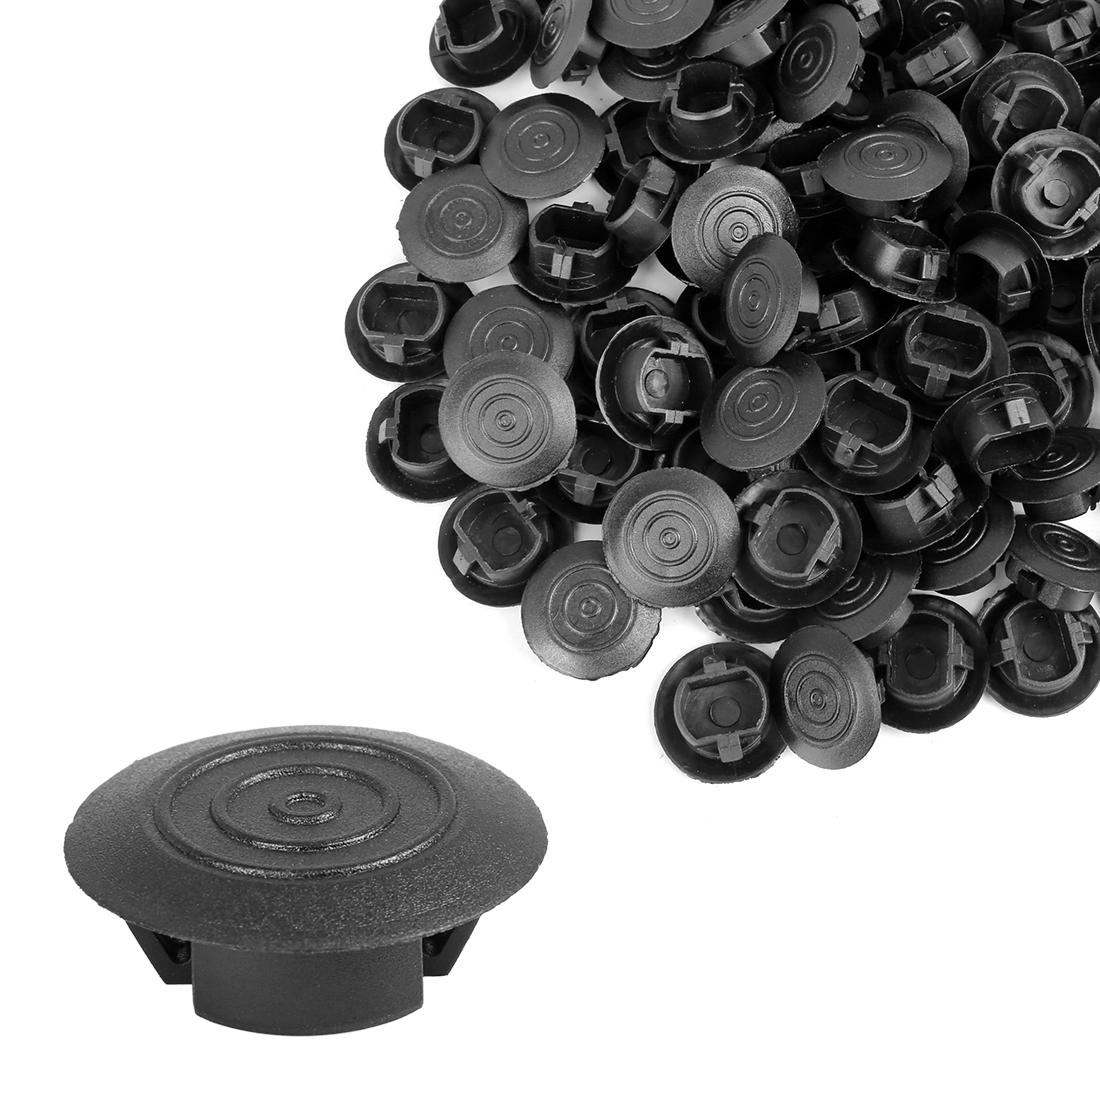 100pcs Nylon Panel Moulding Retainer Clips for Toyota Scion Pontiac 76924-52021